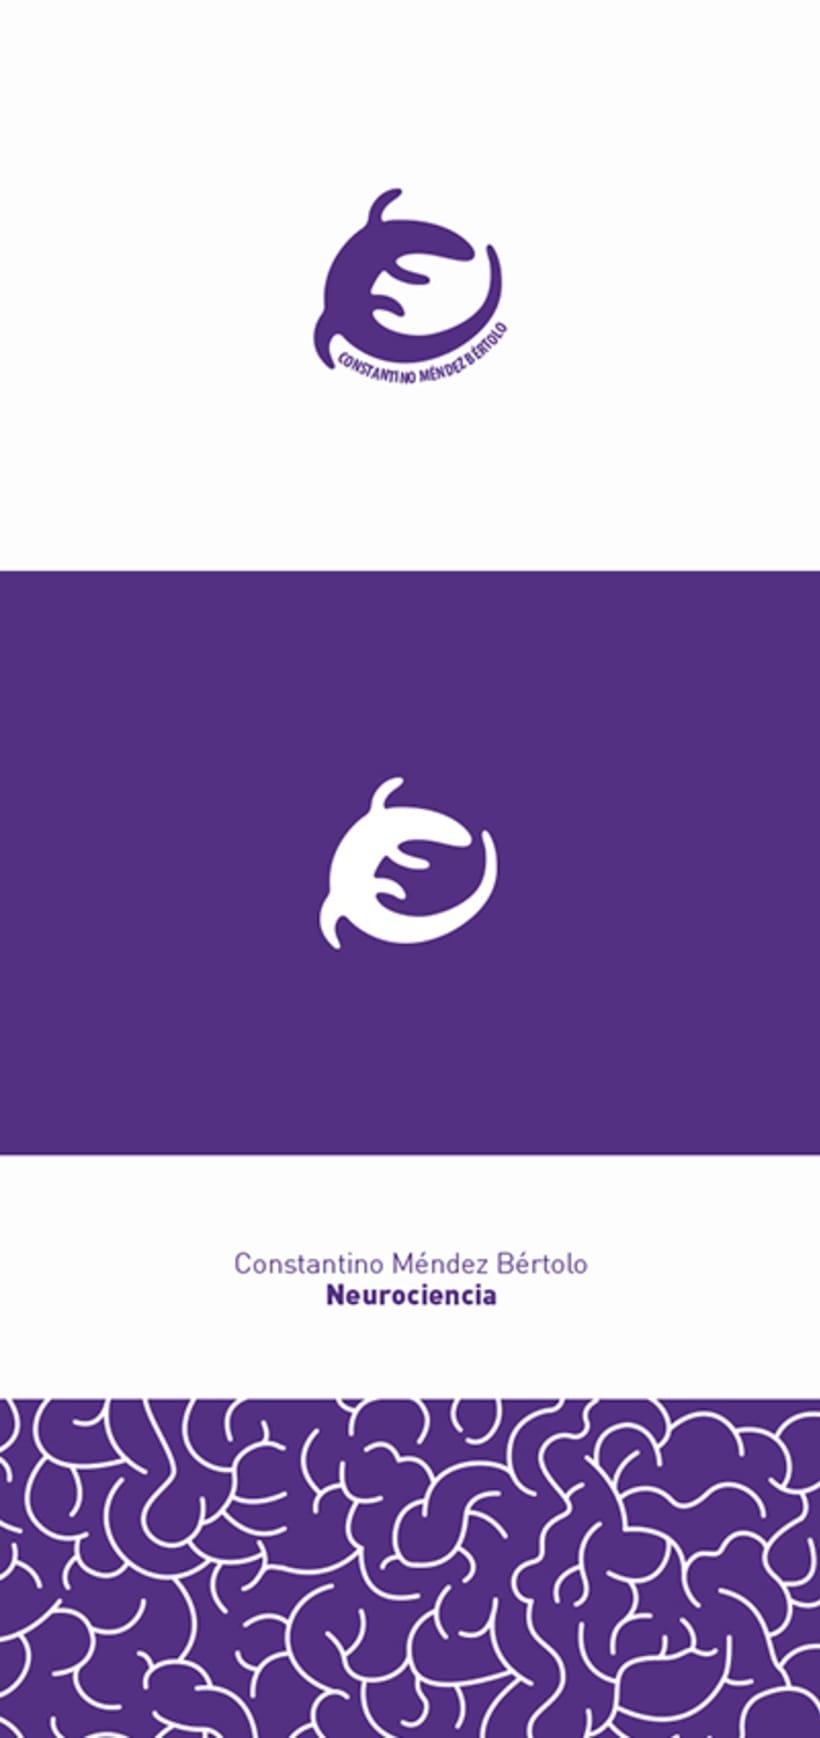 Constantino Méndez-Bértolo  NEUROCIENCIA_Identity 0